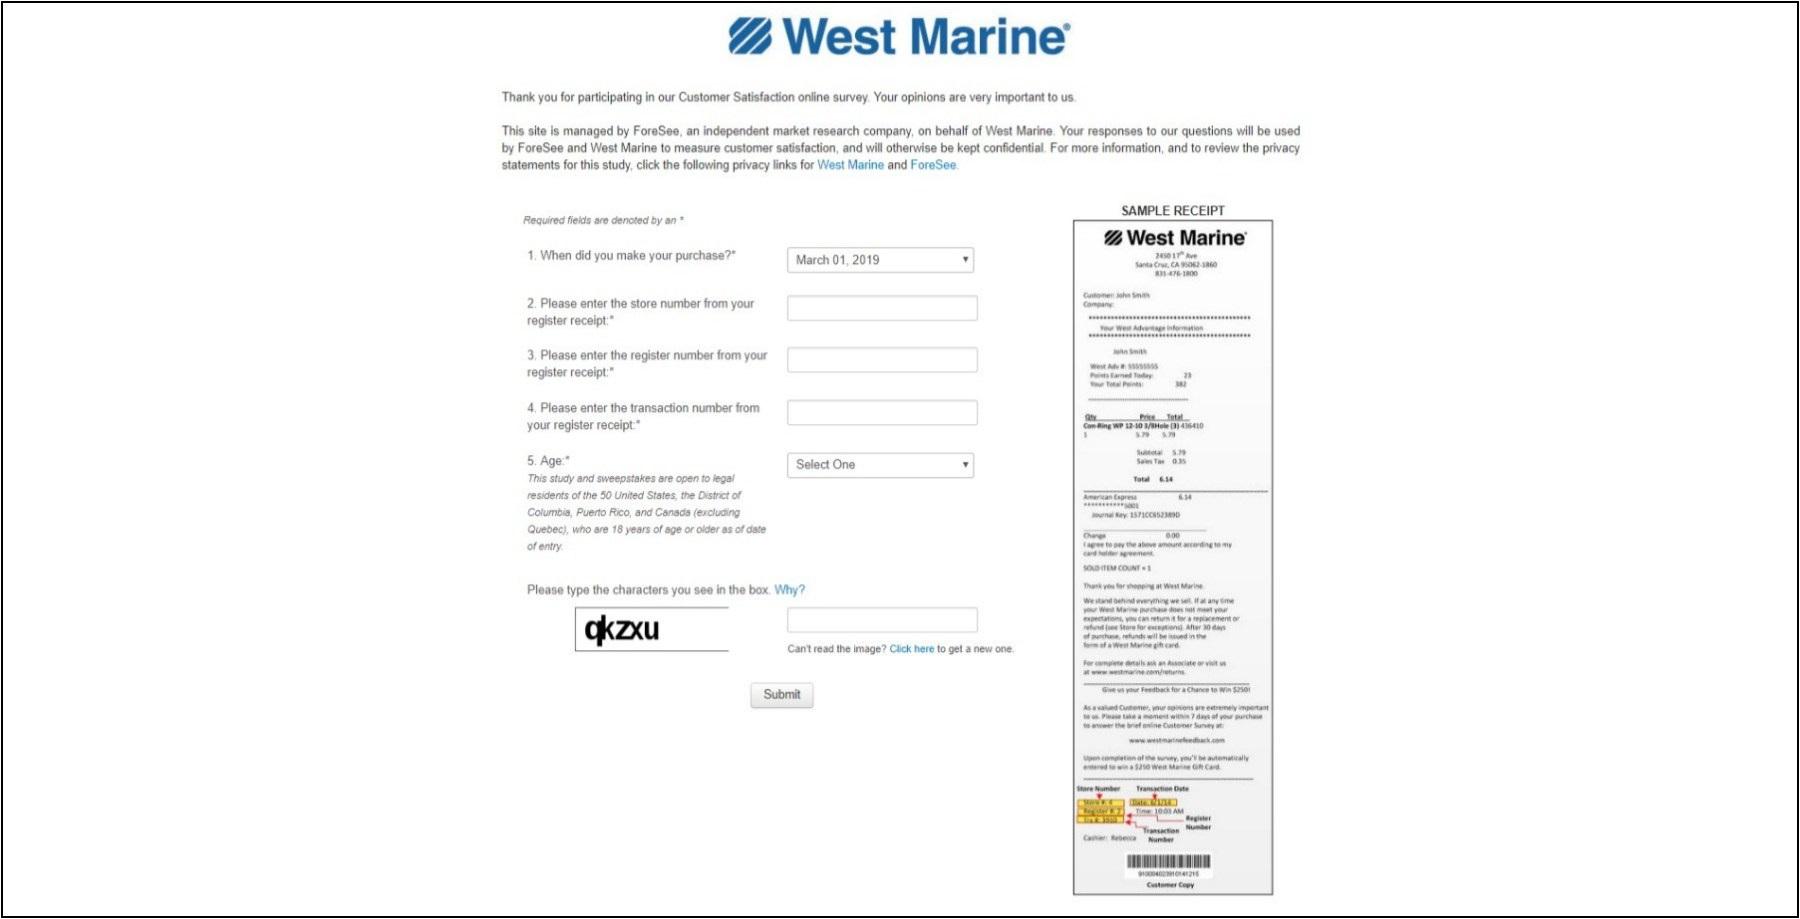 www.MarineFeedback.com